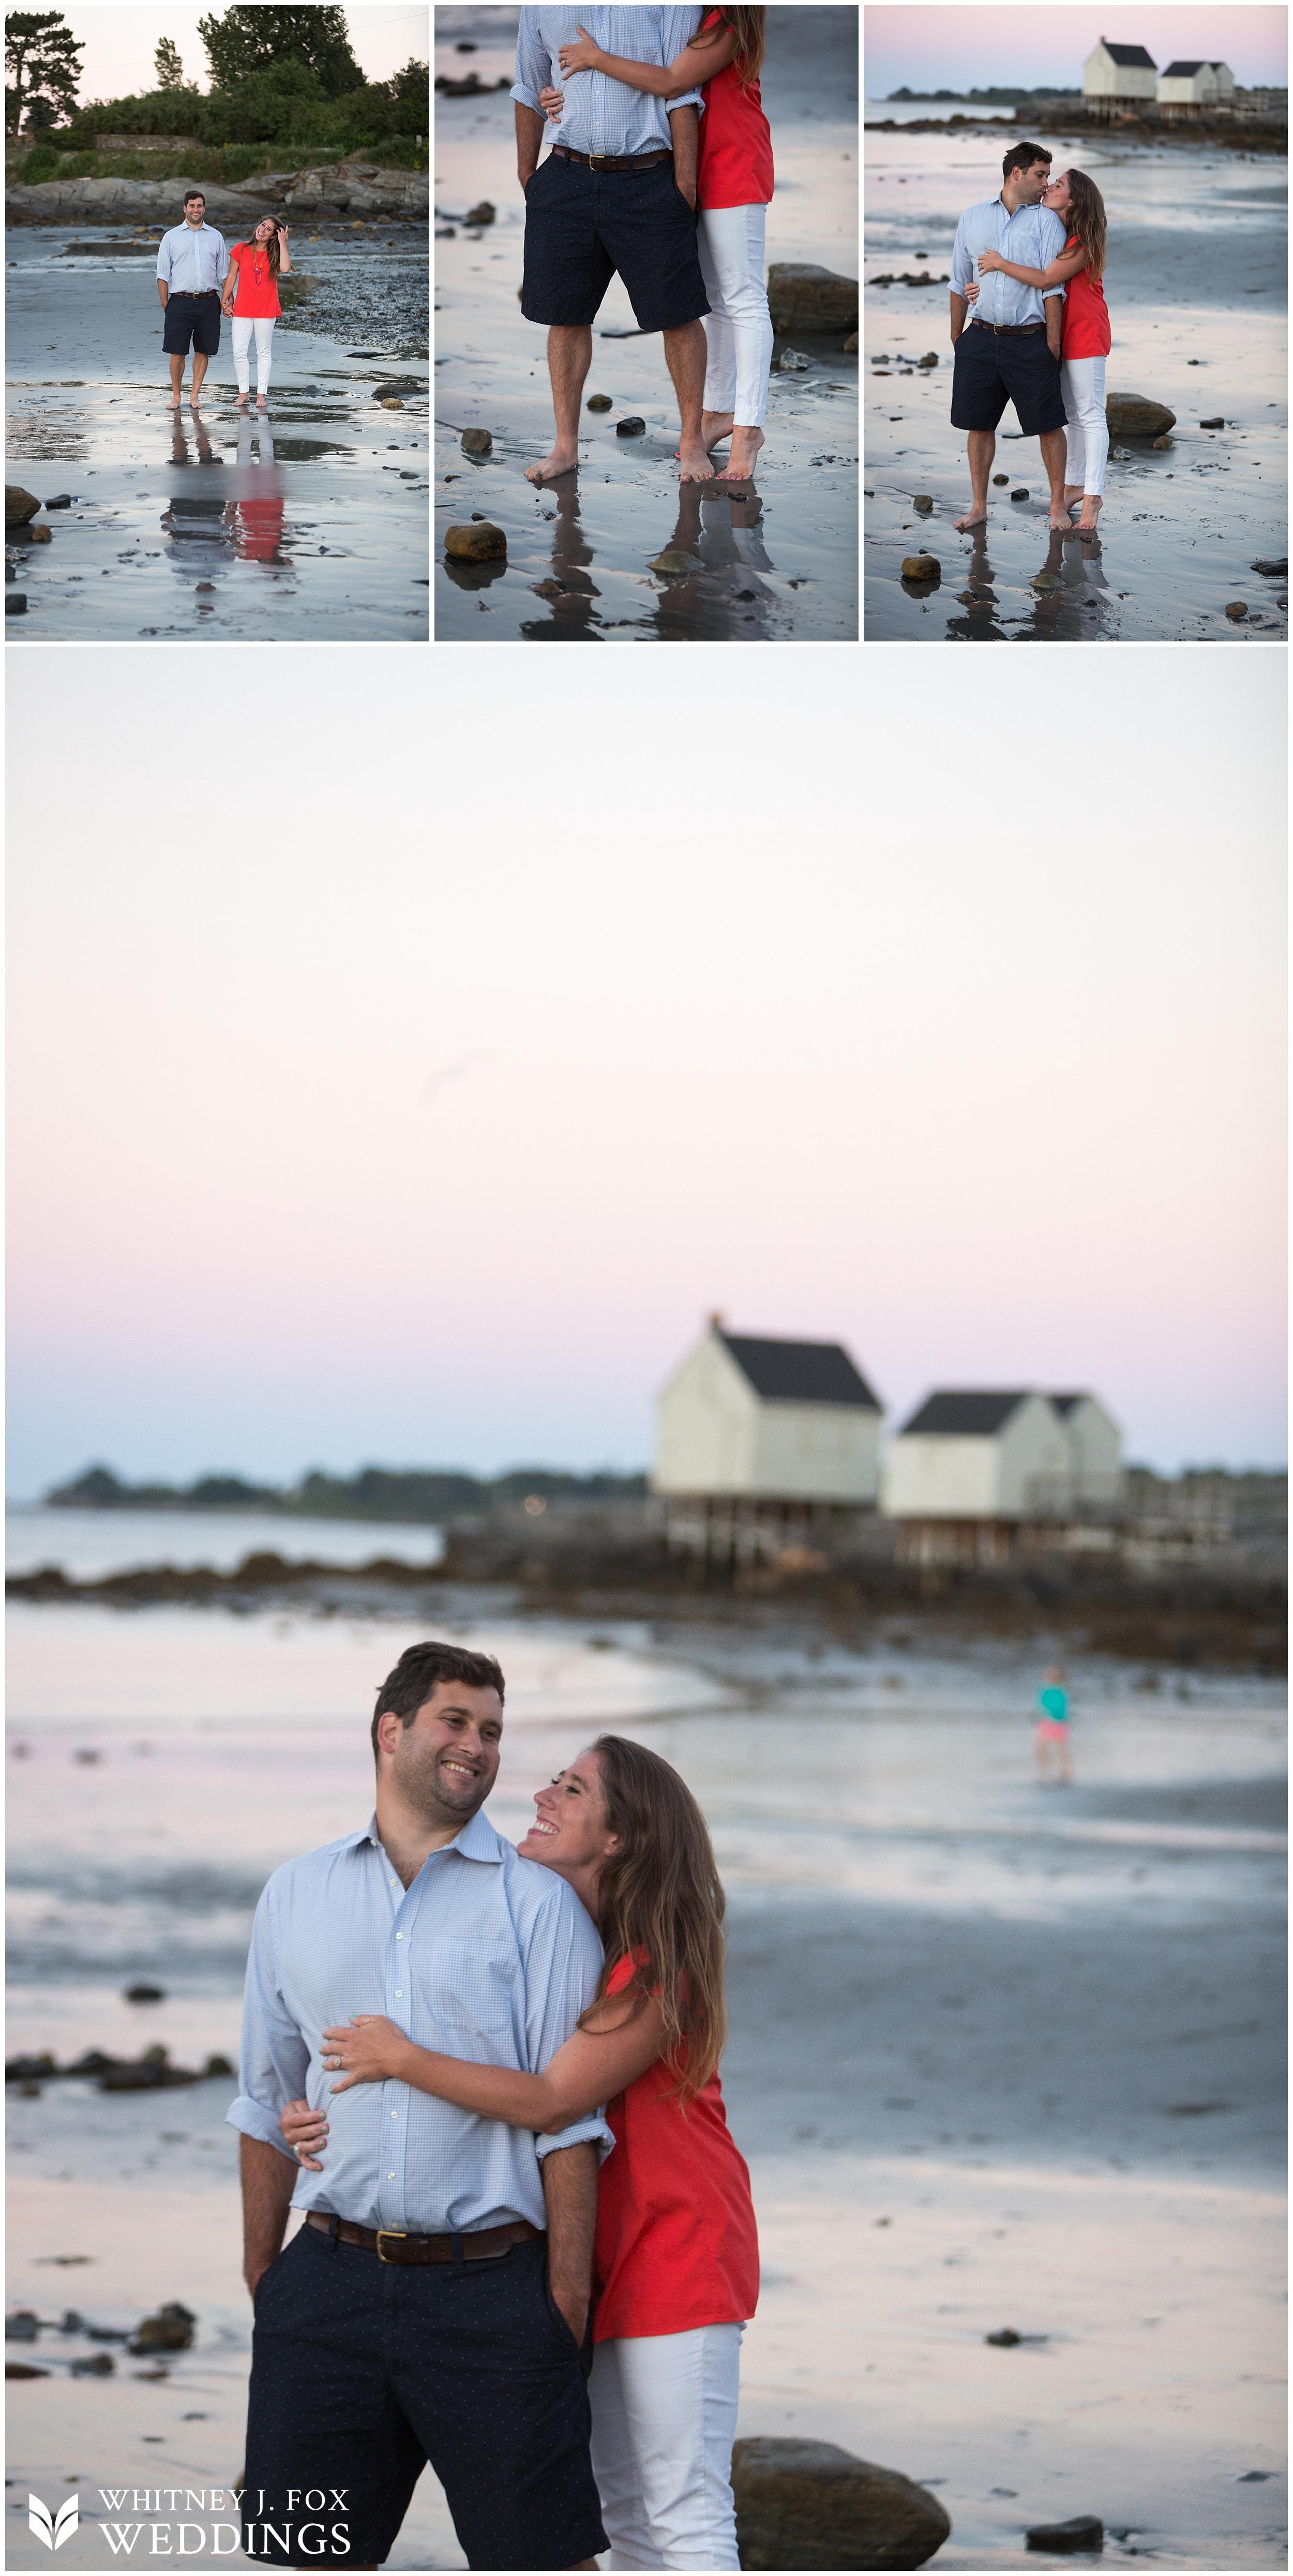 27_239_western_promenade_willard_beach_engagement_session_portland_maine_wedding_photographer_whitney_j_fox_8294.jpg